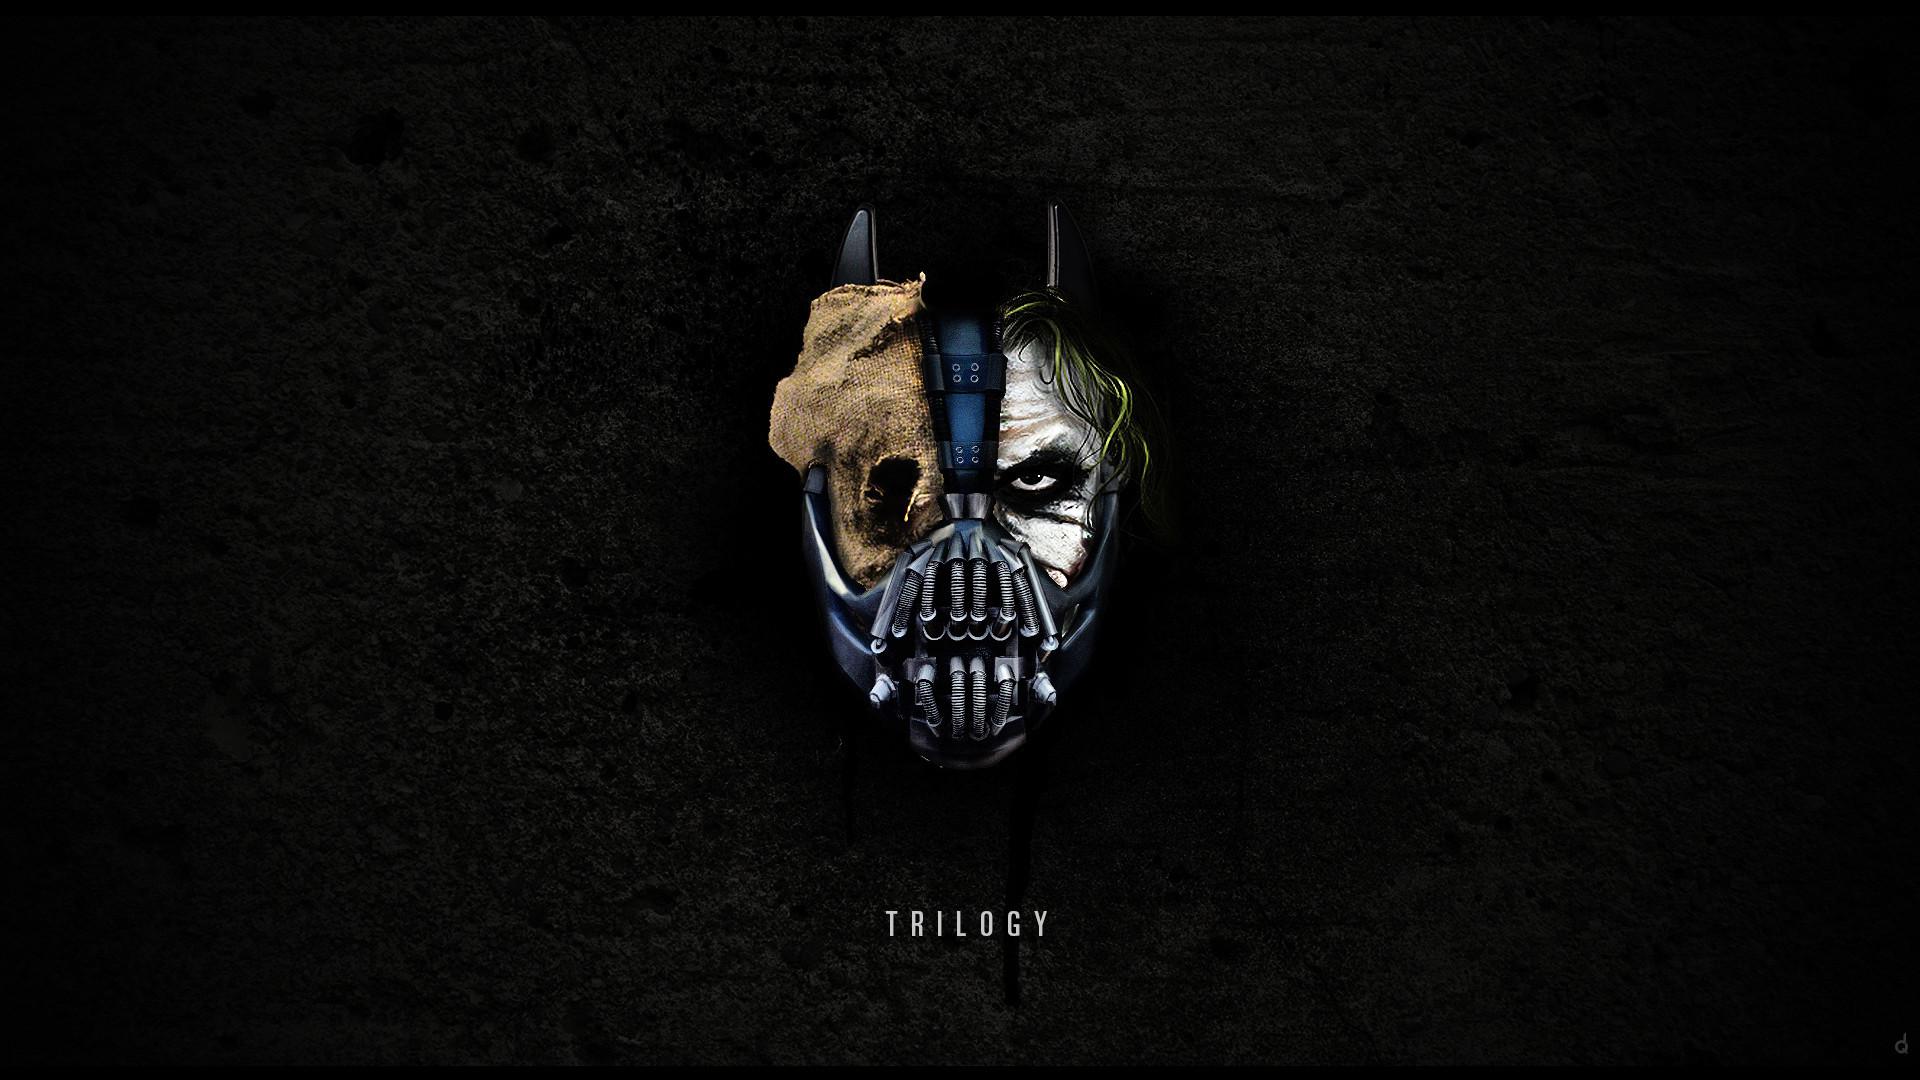 Res: 1920x1080, The Dark Knight Trilogy Wallpaper